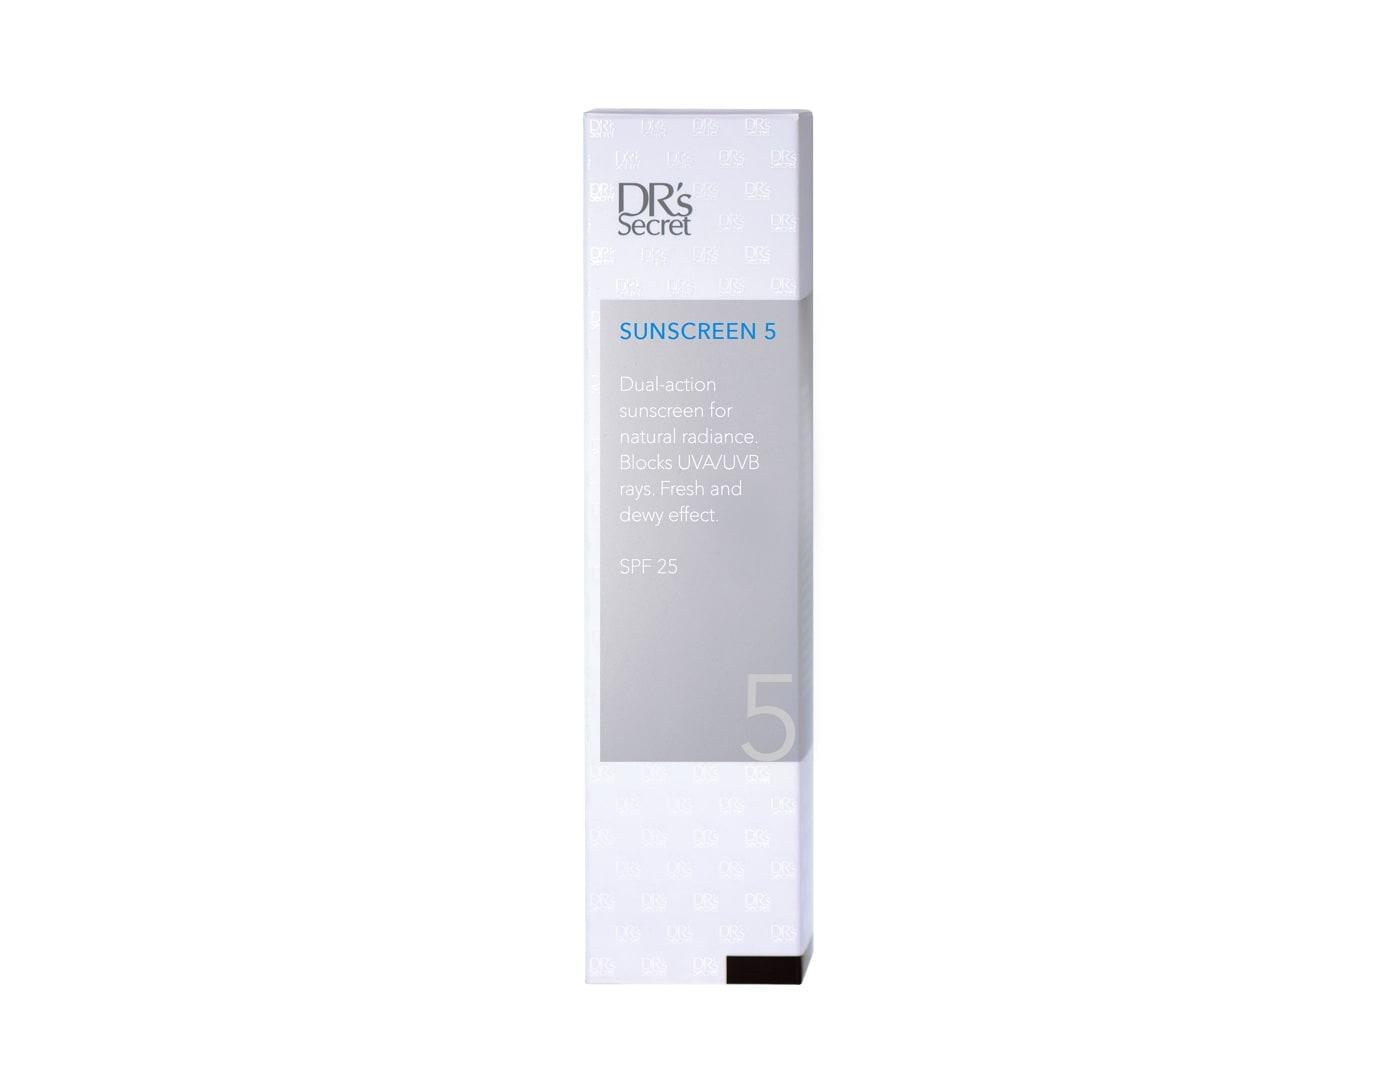 DR's Secret Sunscreen 5 box front packaging